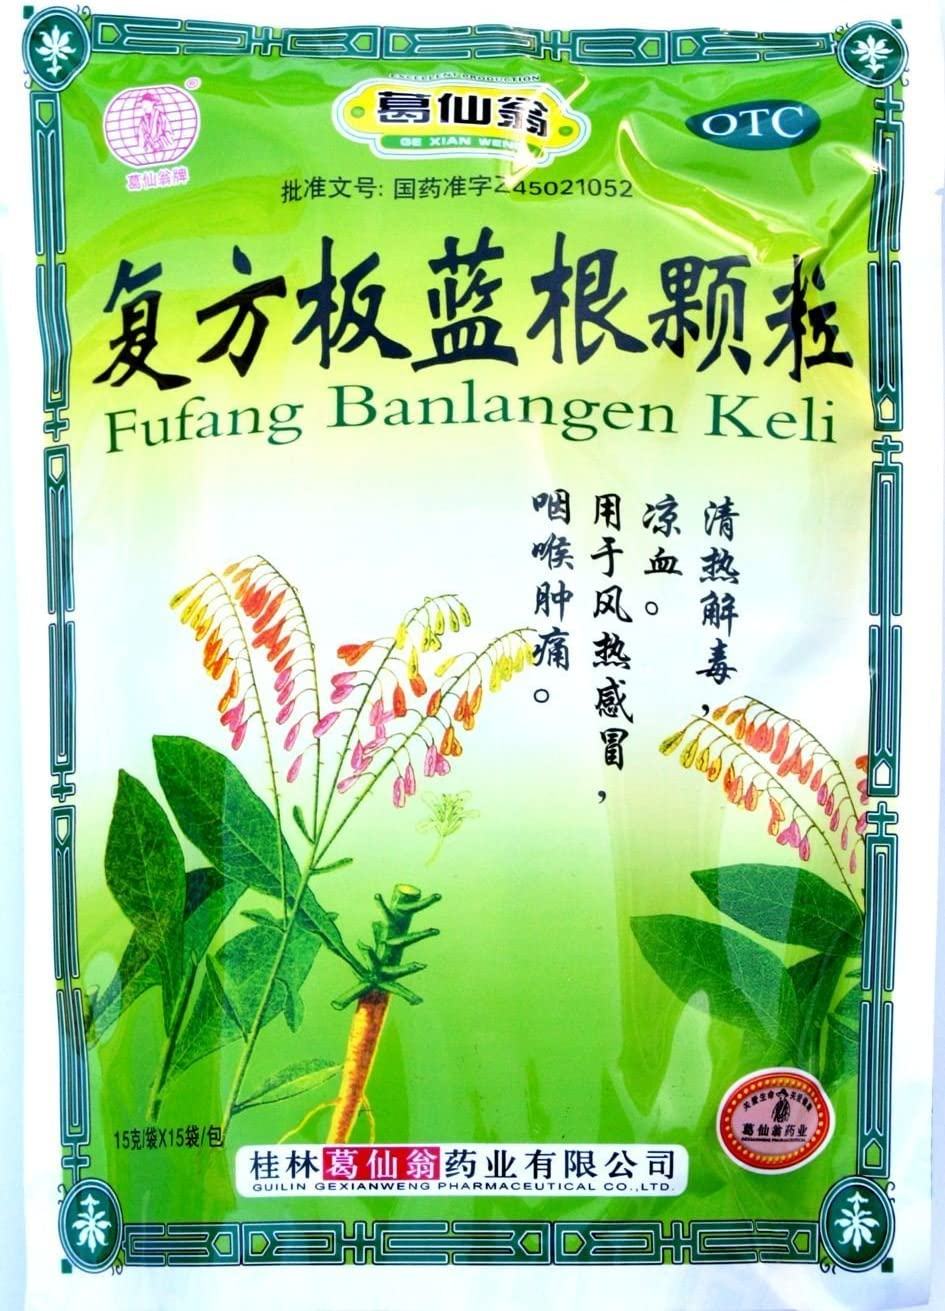 Banlangen TEA Fufang Keli Sachets Max 58% OFF - 15 High quality new Individual